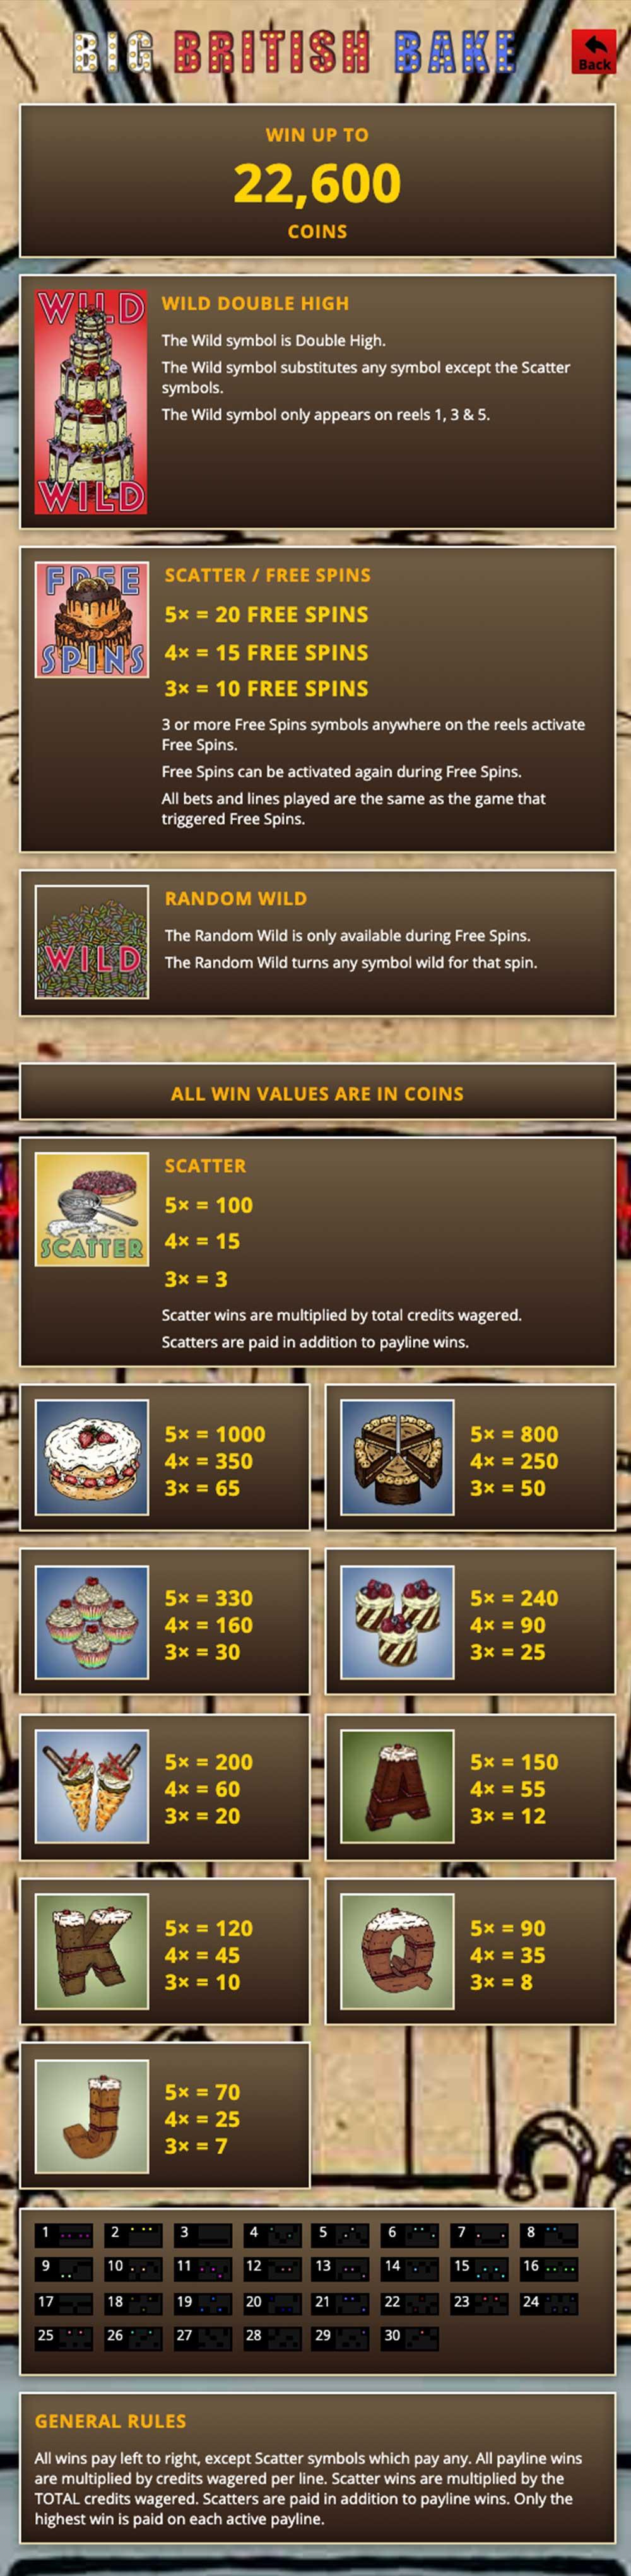 Big British Bake Pay Table Screenshot, Jackpot Wheel